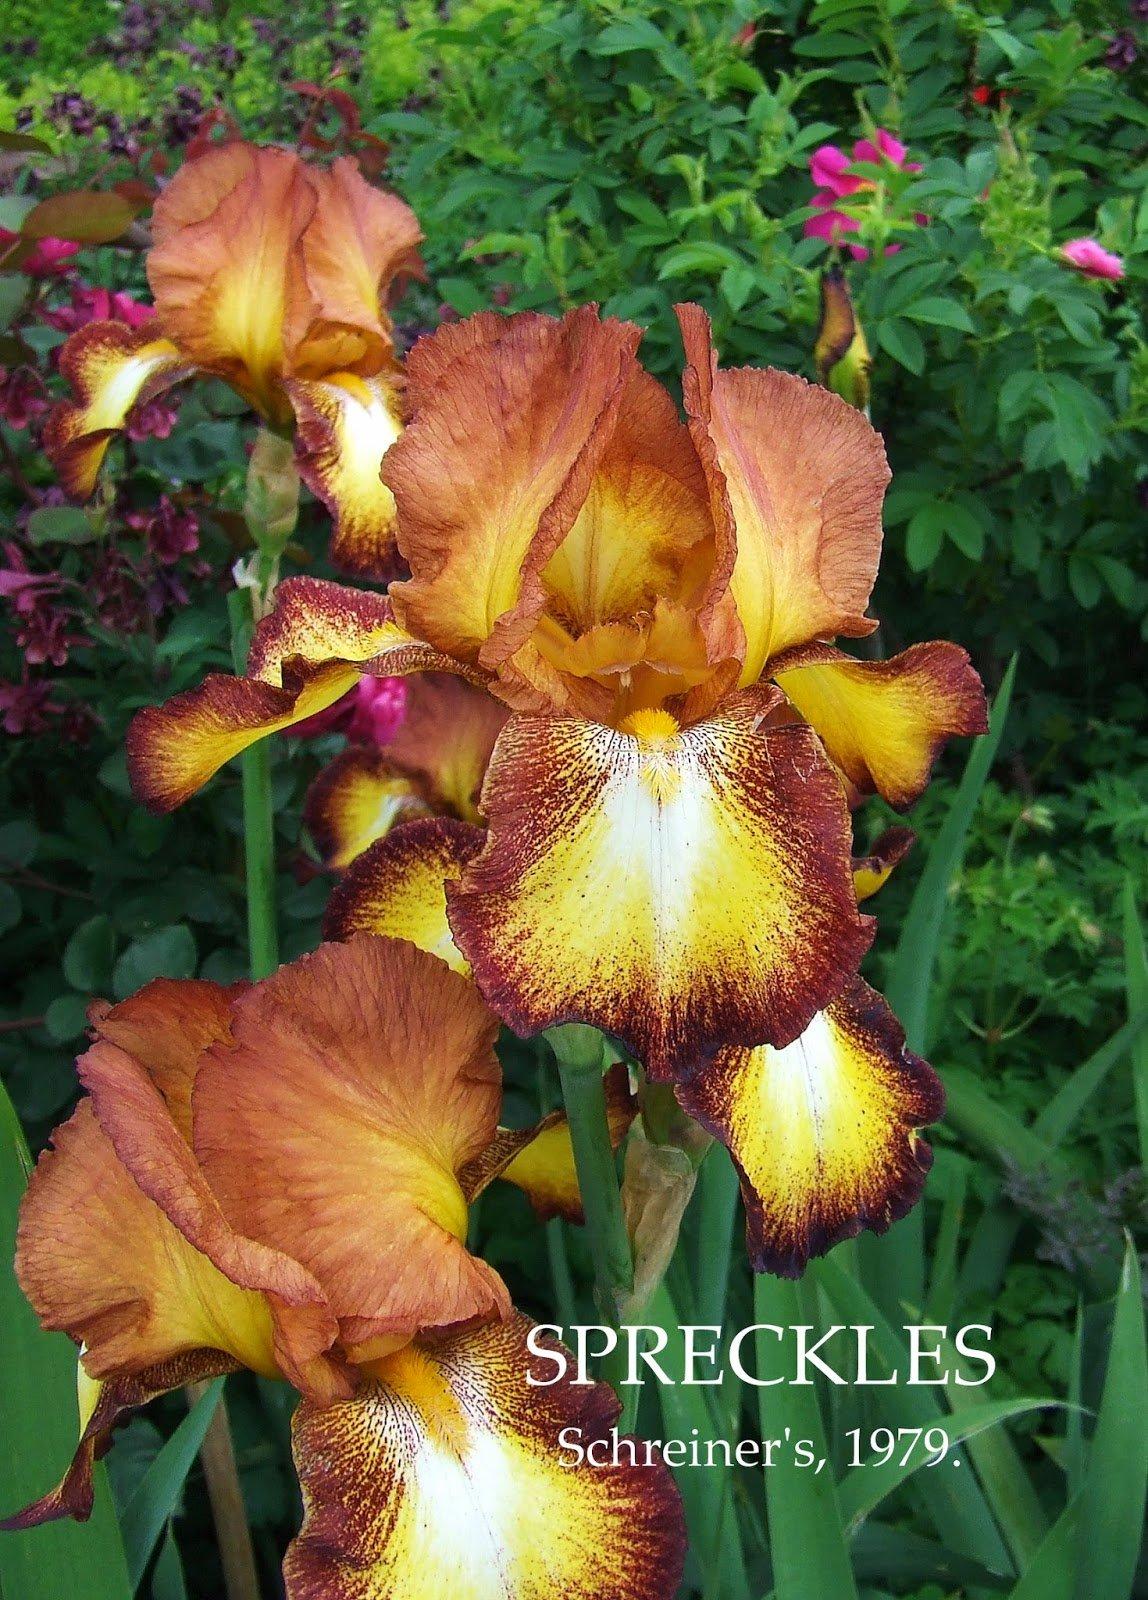 Iris-Spreckles-2